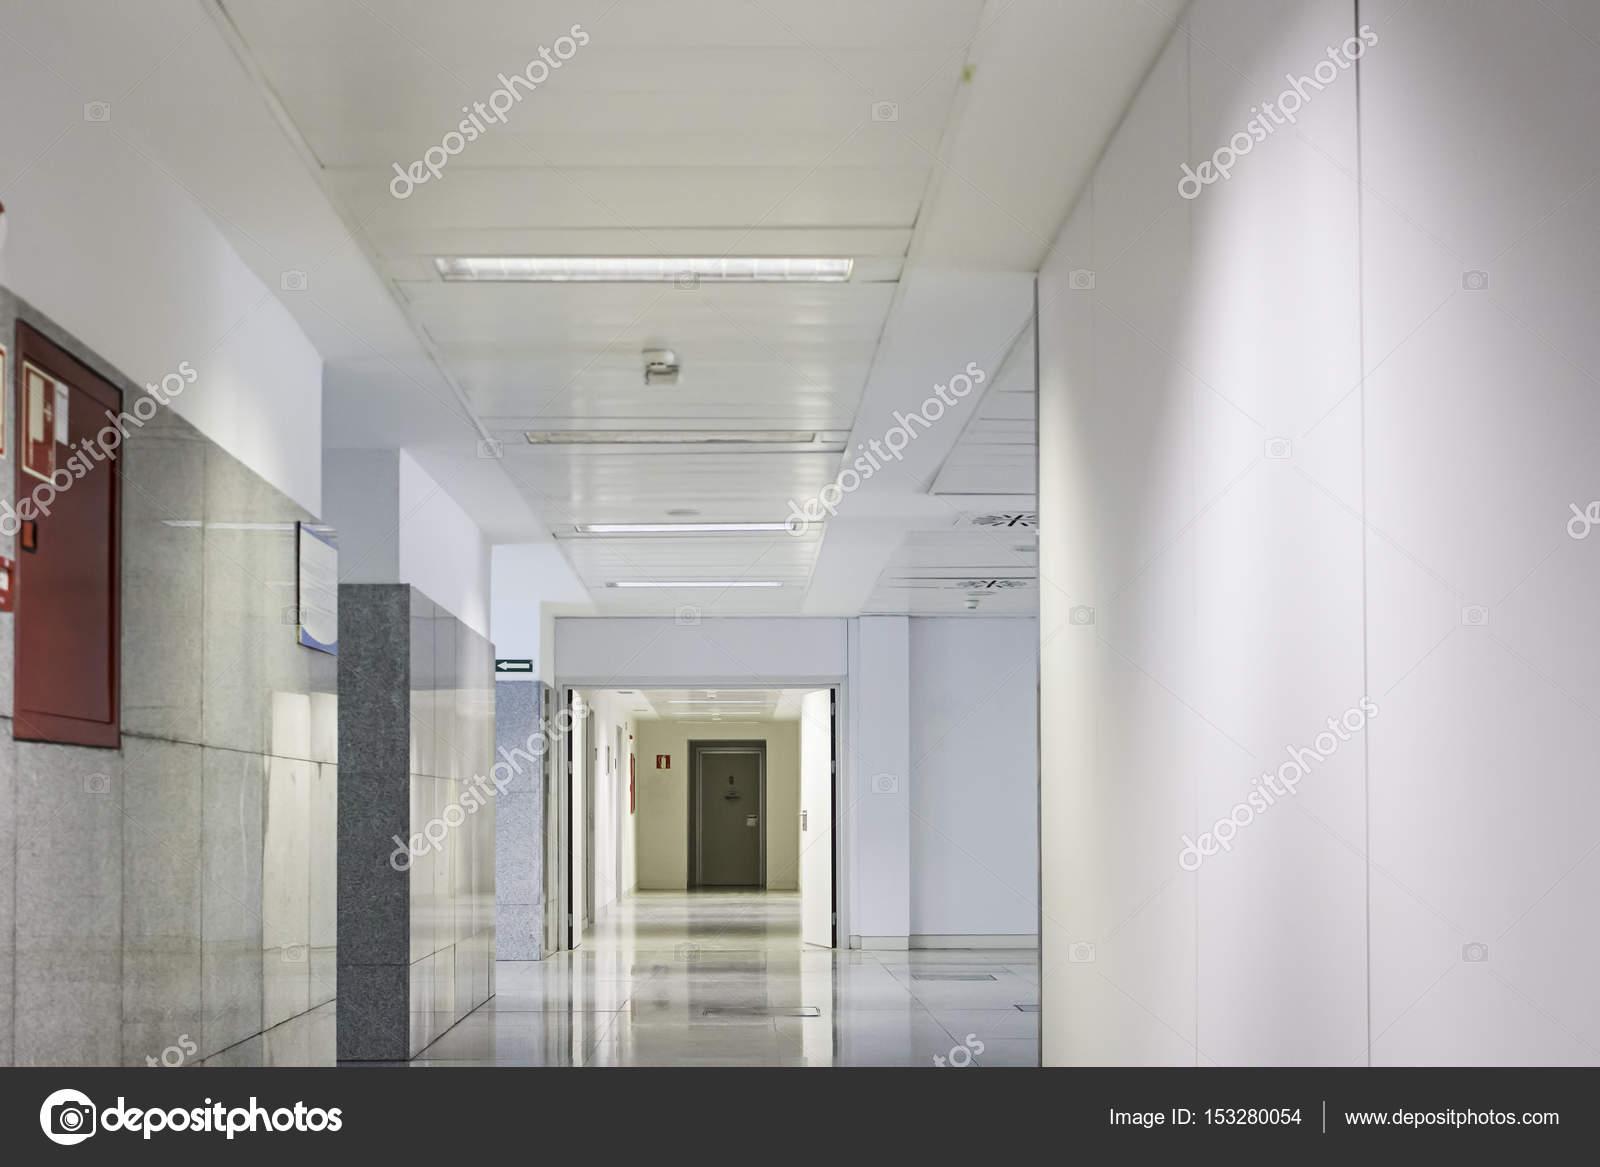 https://st3.depositphotos.com/1730367/15328/i/1600/depositphotos_153280054-stockafbeelding-interieur-gang-ziekenhuis.jpg